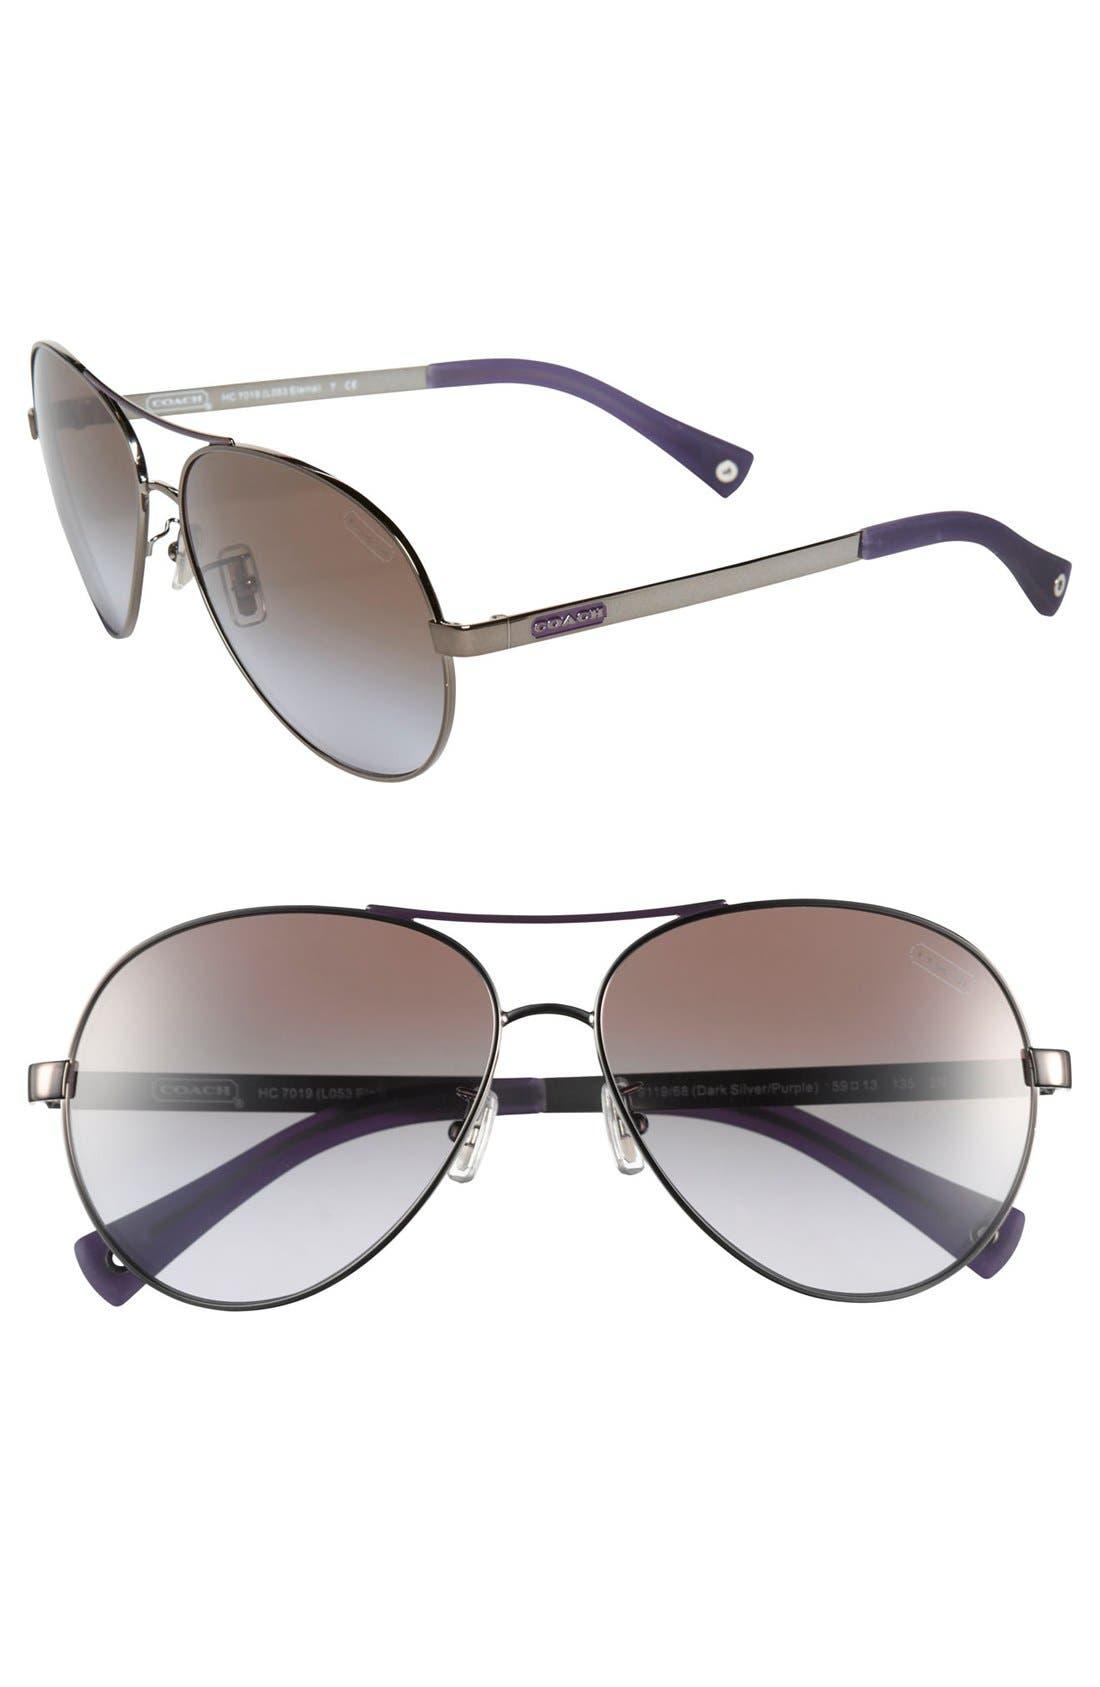 Alternate Image 1 Selected - COACH 'Elaina' 59mm Aviator Sunglasses